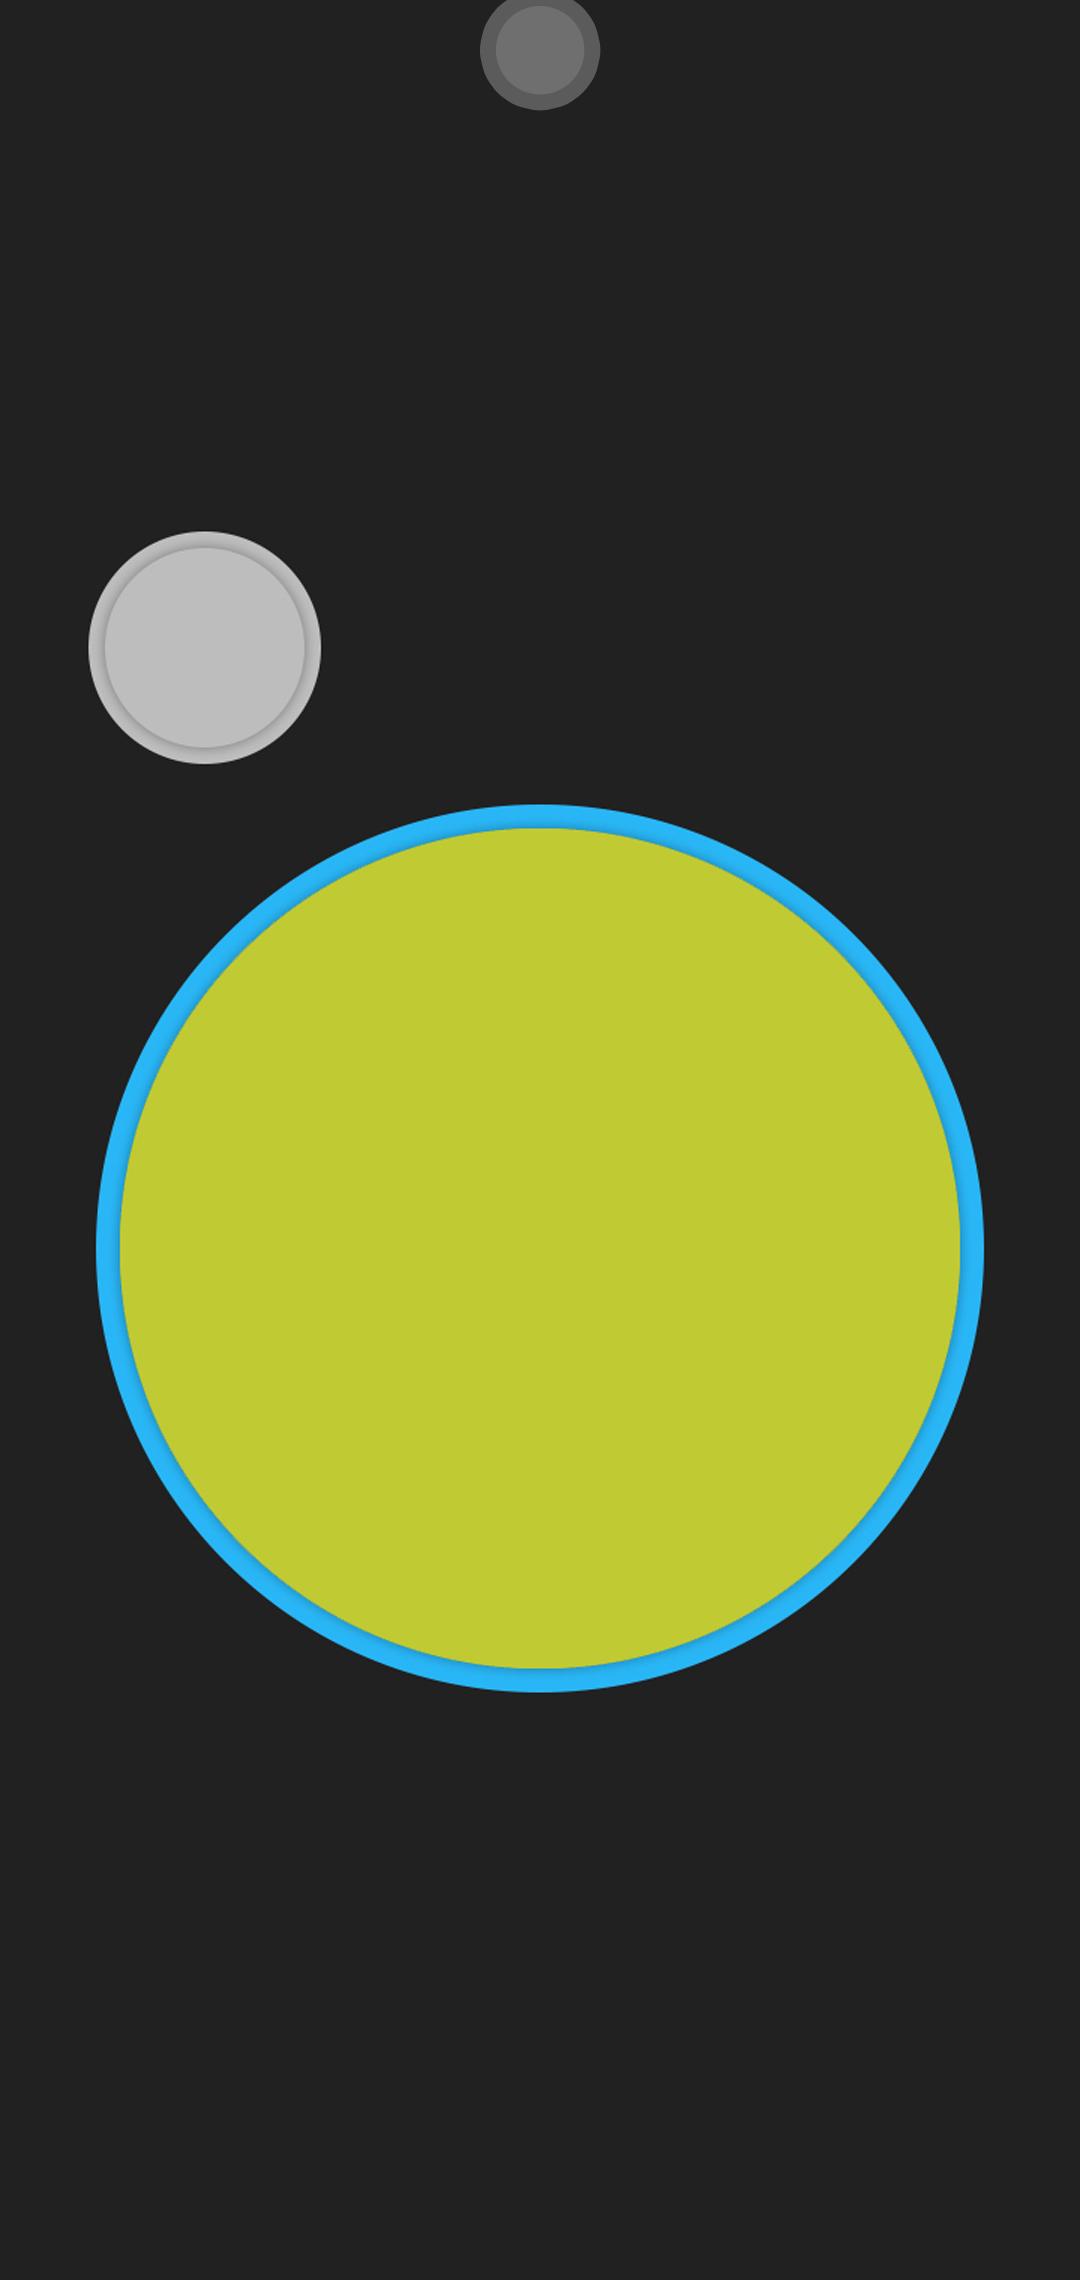 material circle green wallpaper